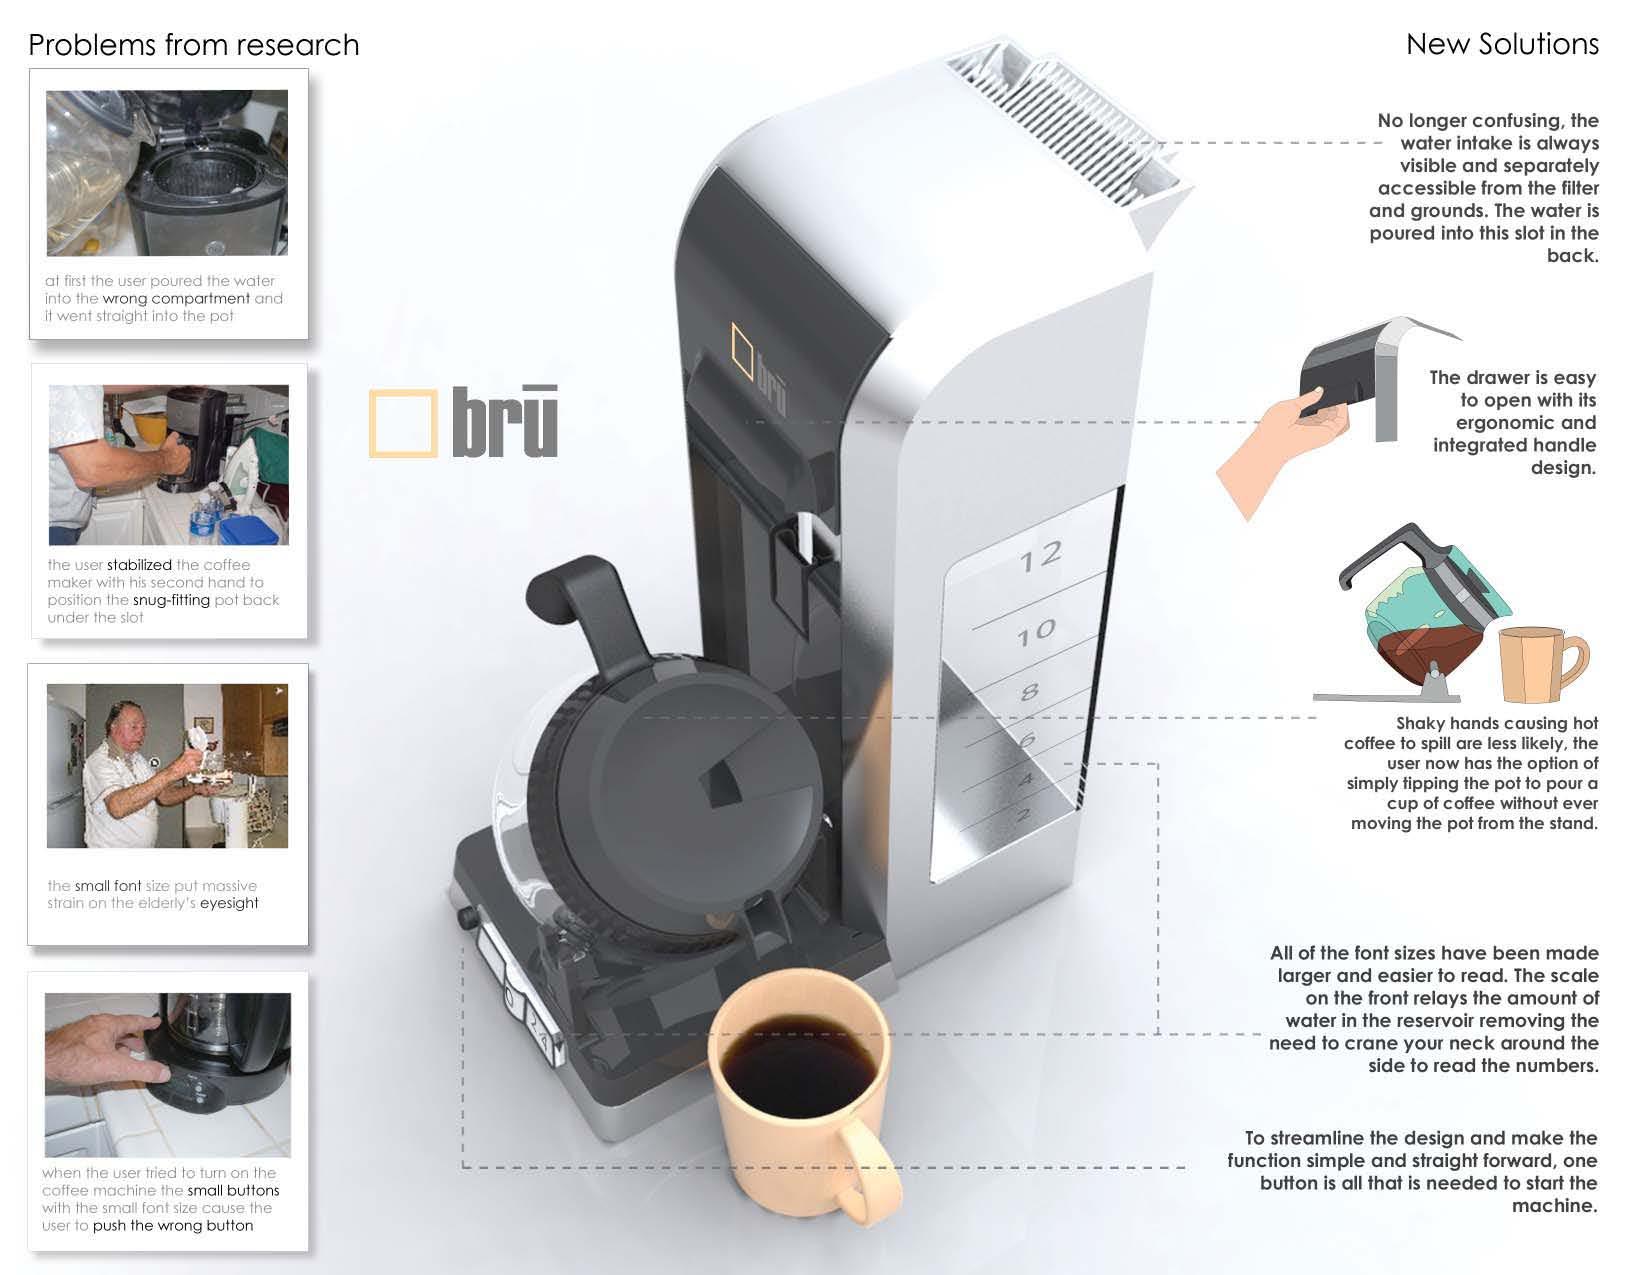 Bru Coffee Maker by Jordan Bailey at Coroflot.com